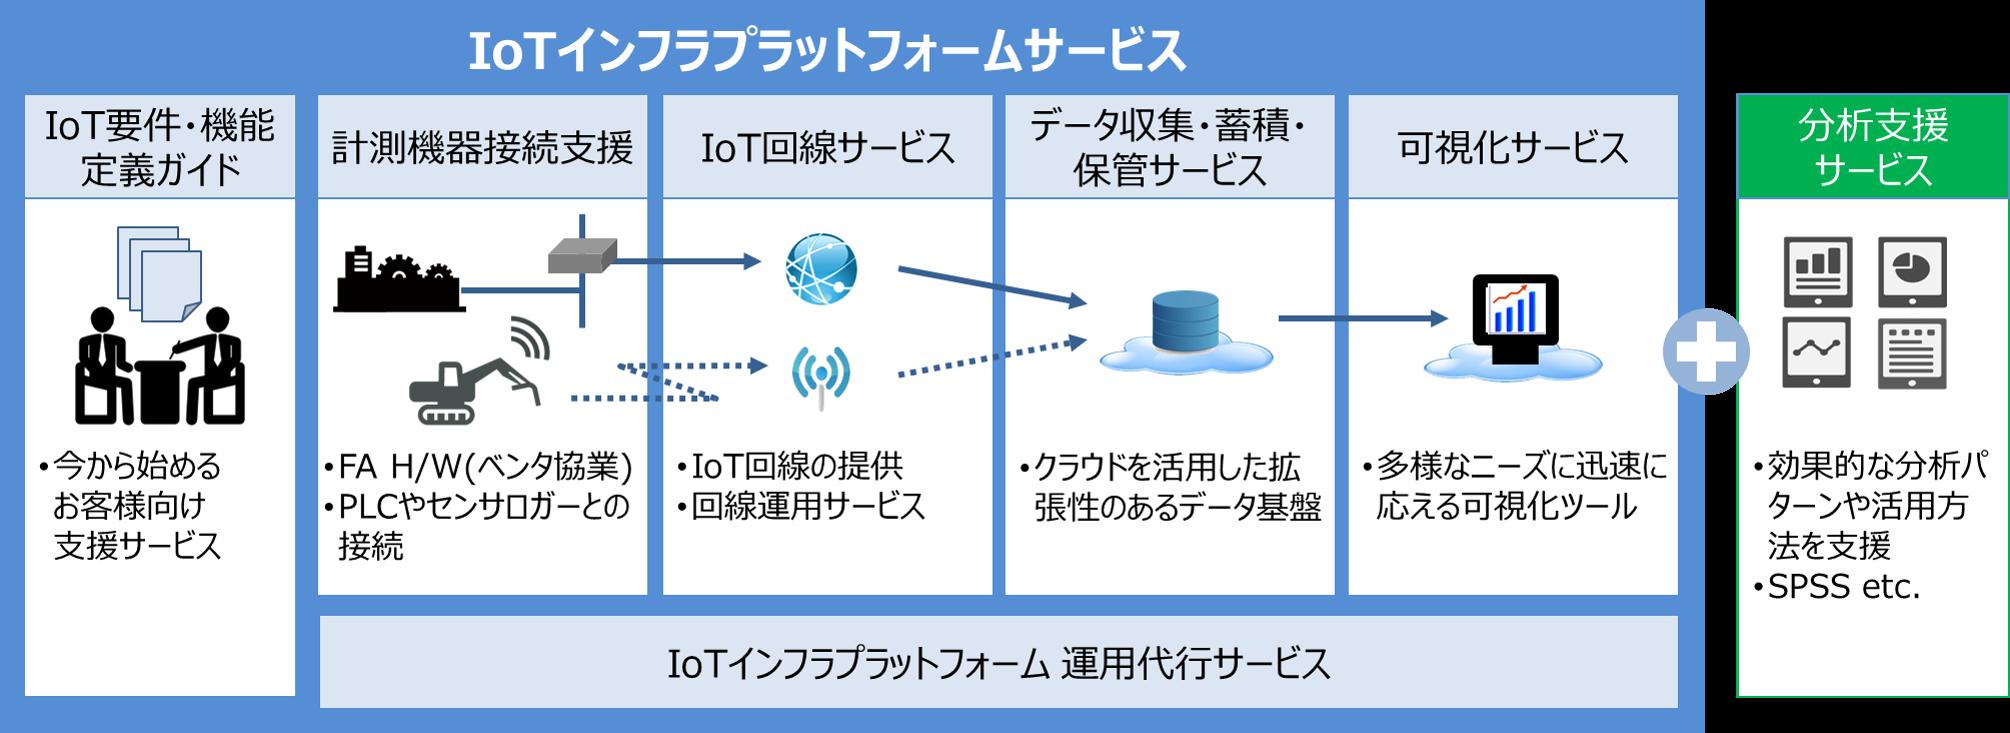 IoTインフラプラットフォームサービス